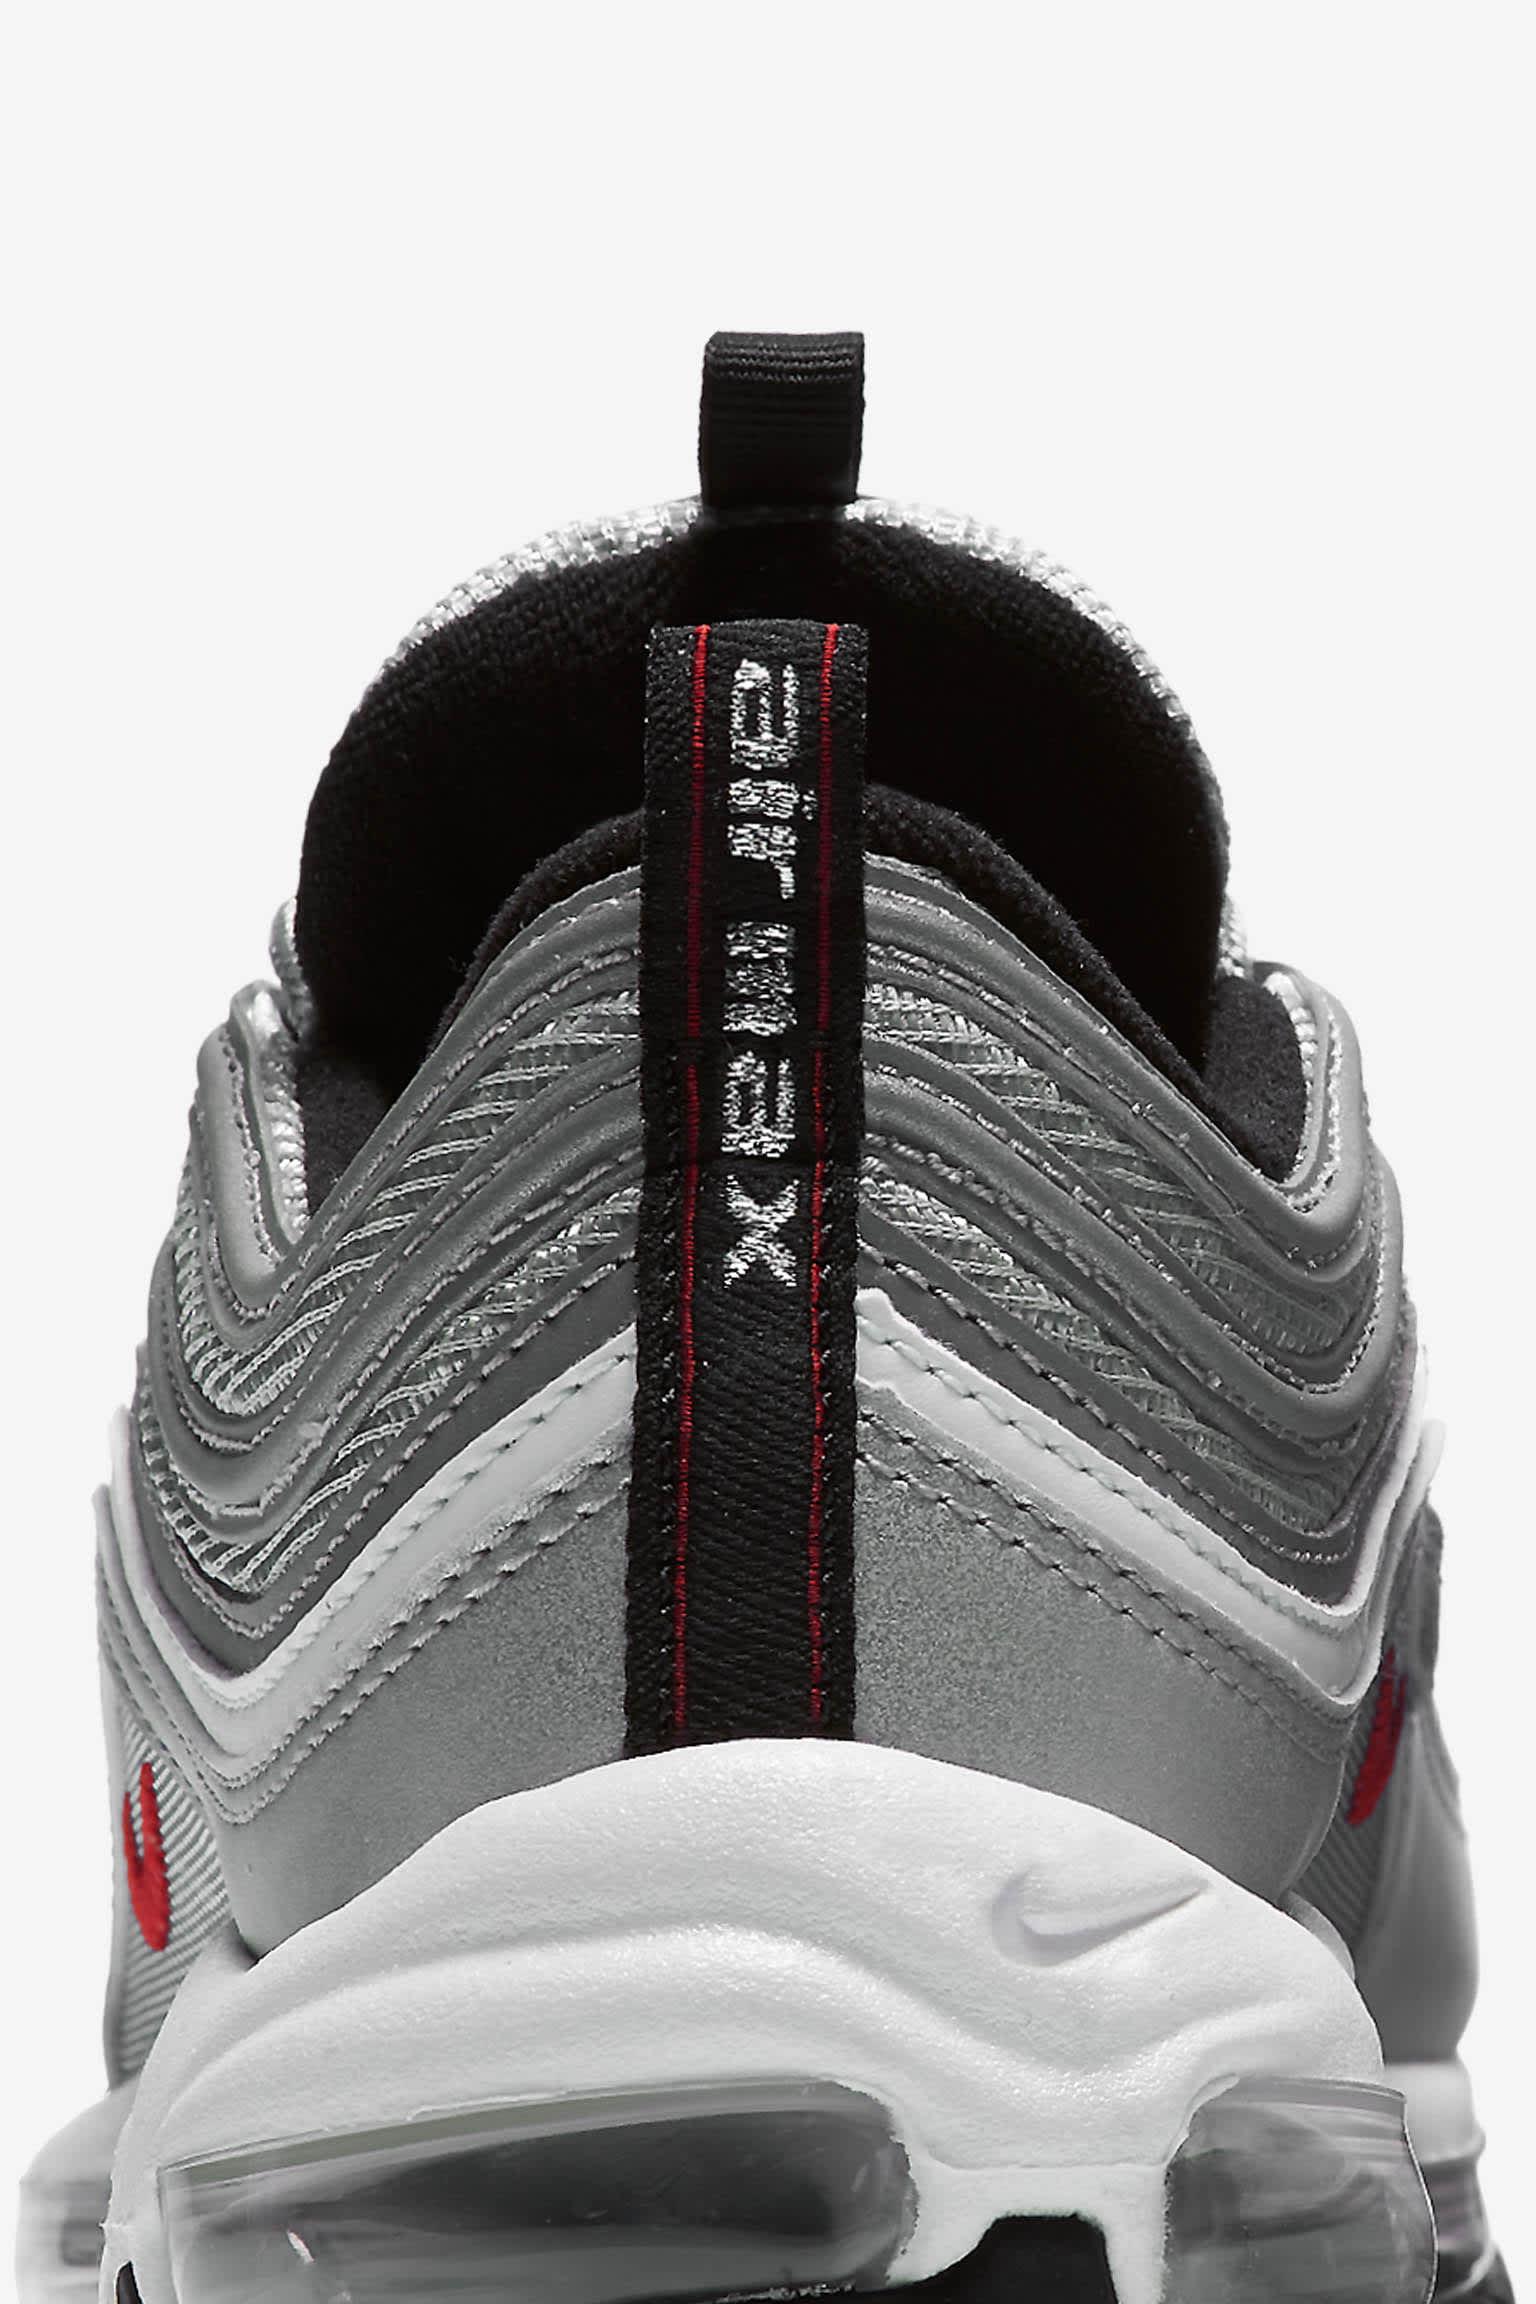 Women's Nike Air Max 97 OG 'Metallic Silver'. Nike SNKRS